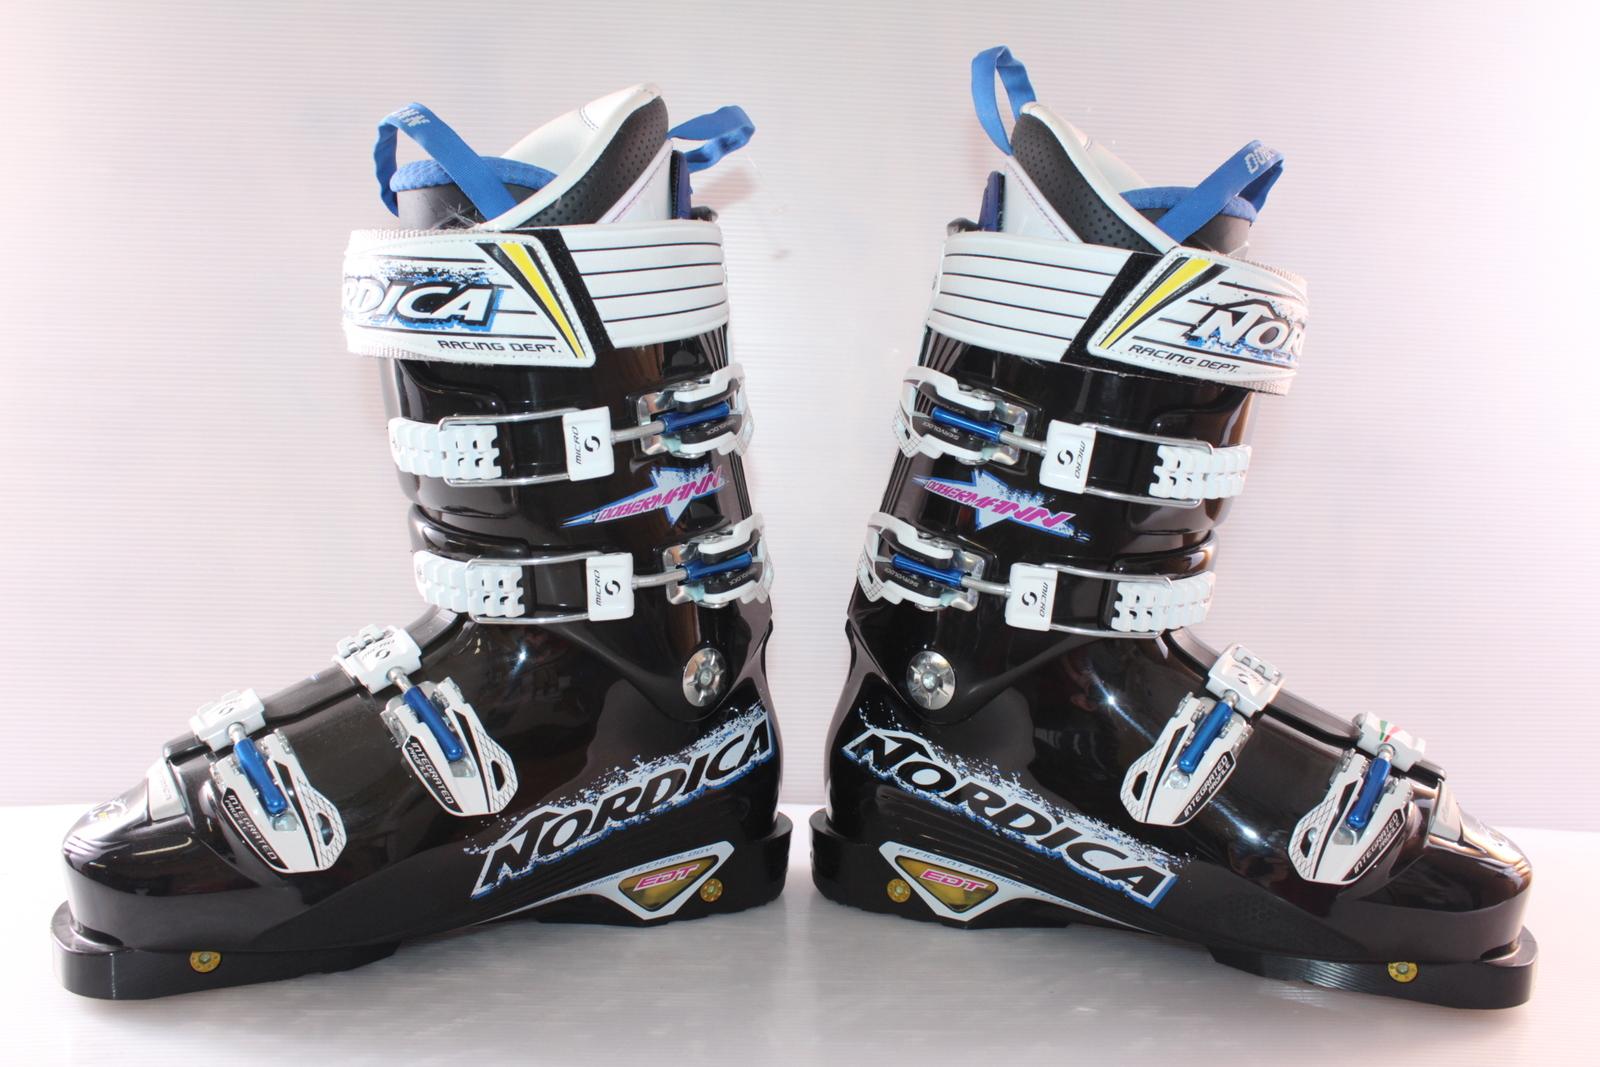 Lyžařské boty Nordica Dobermann PRO  130 vel. EU41 flexe 130